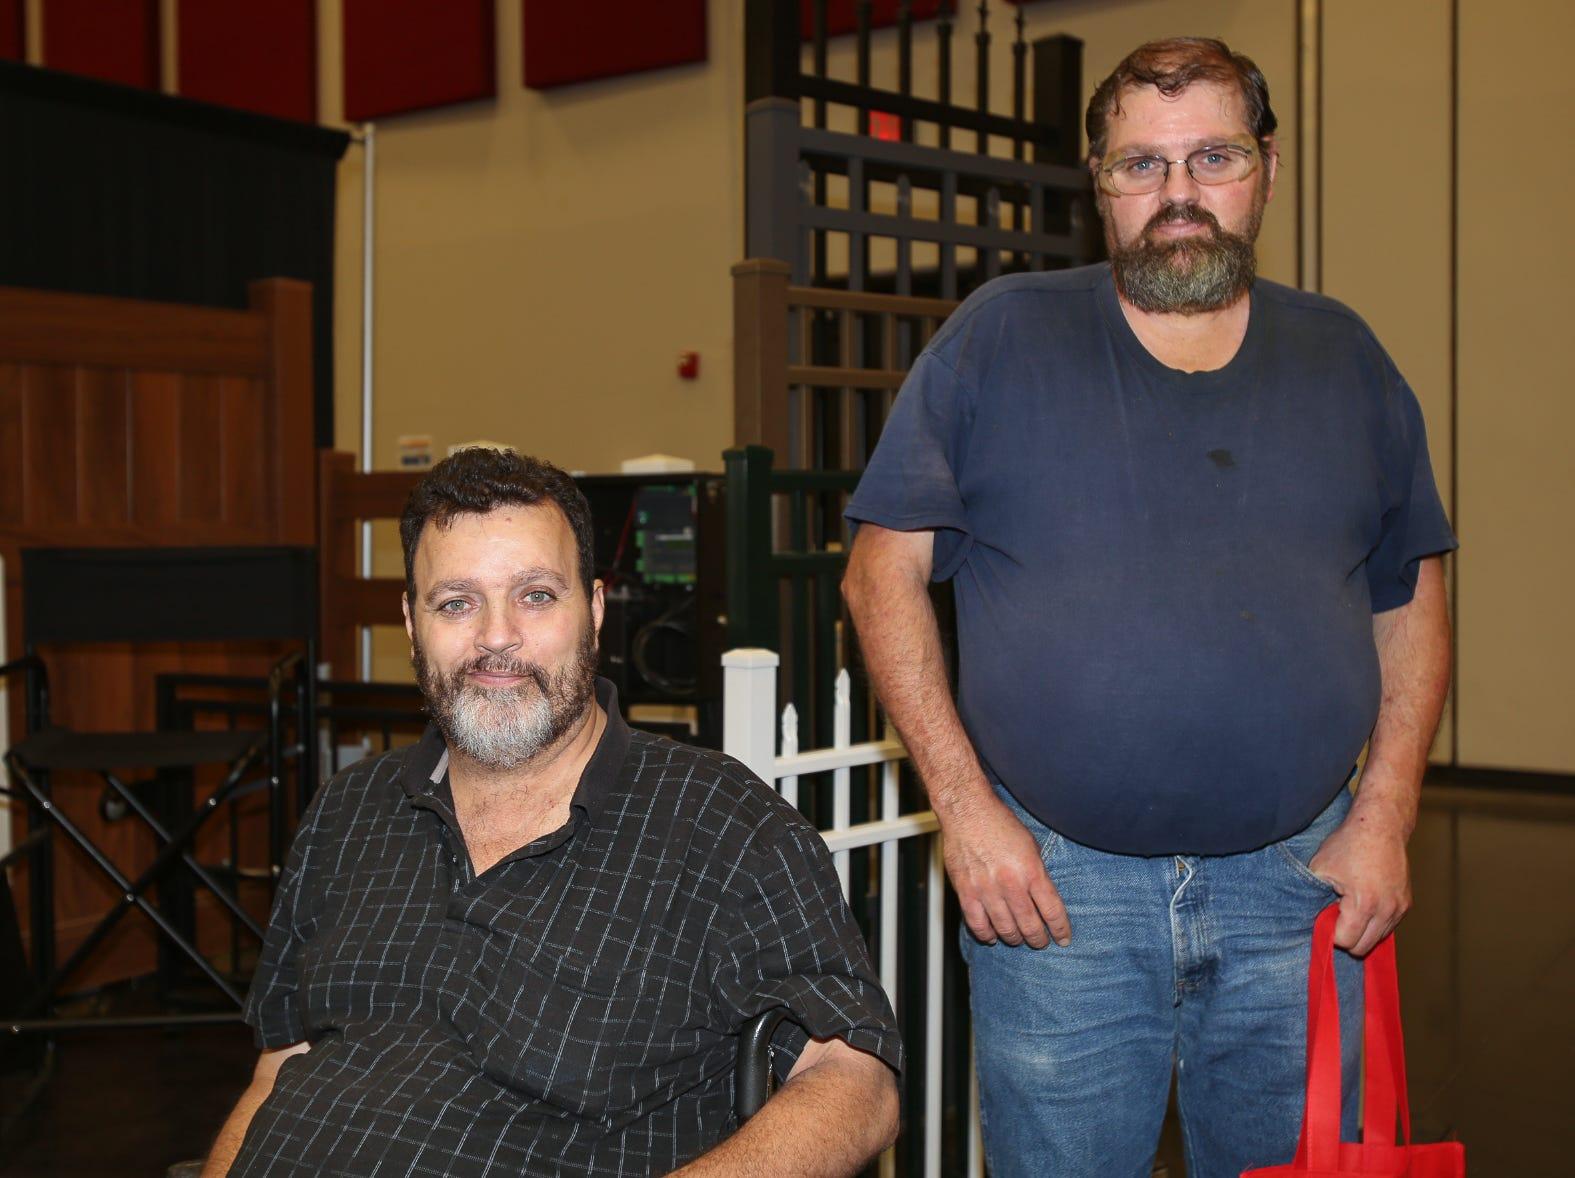 Jimmy and Jerry Edwards